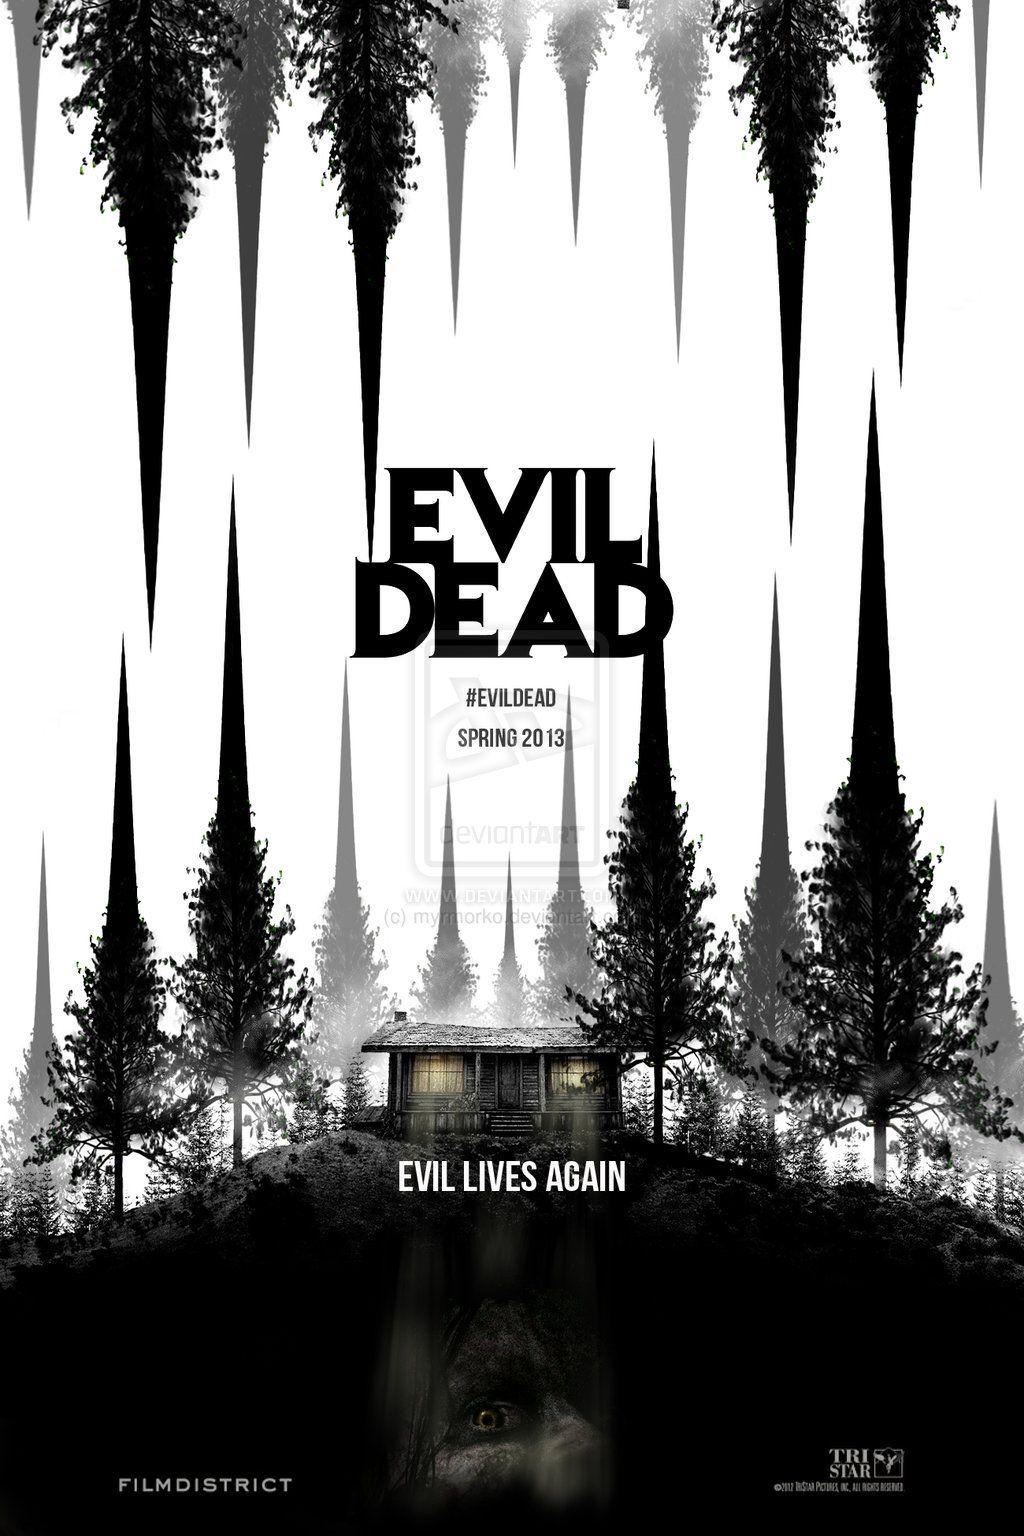 evil_dead_2013_by_myrmorko-d5jbqp4+black+and+white+poster+trees+evil+lives+again.jpg 1,024×1,536 pixels